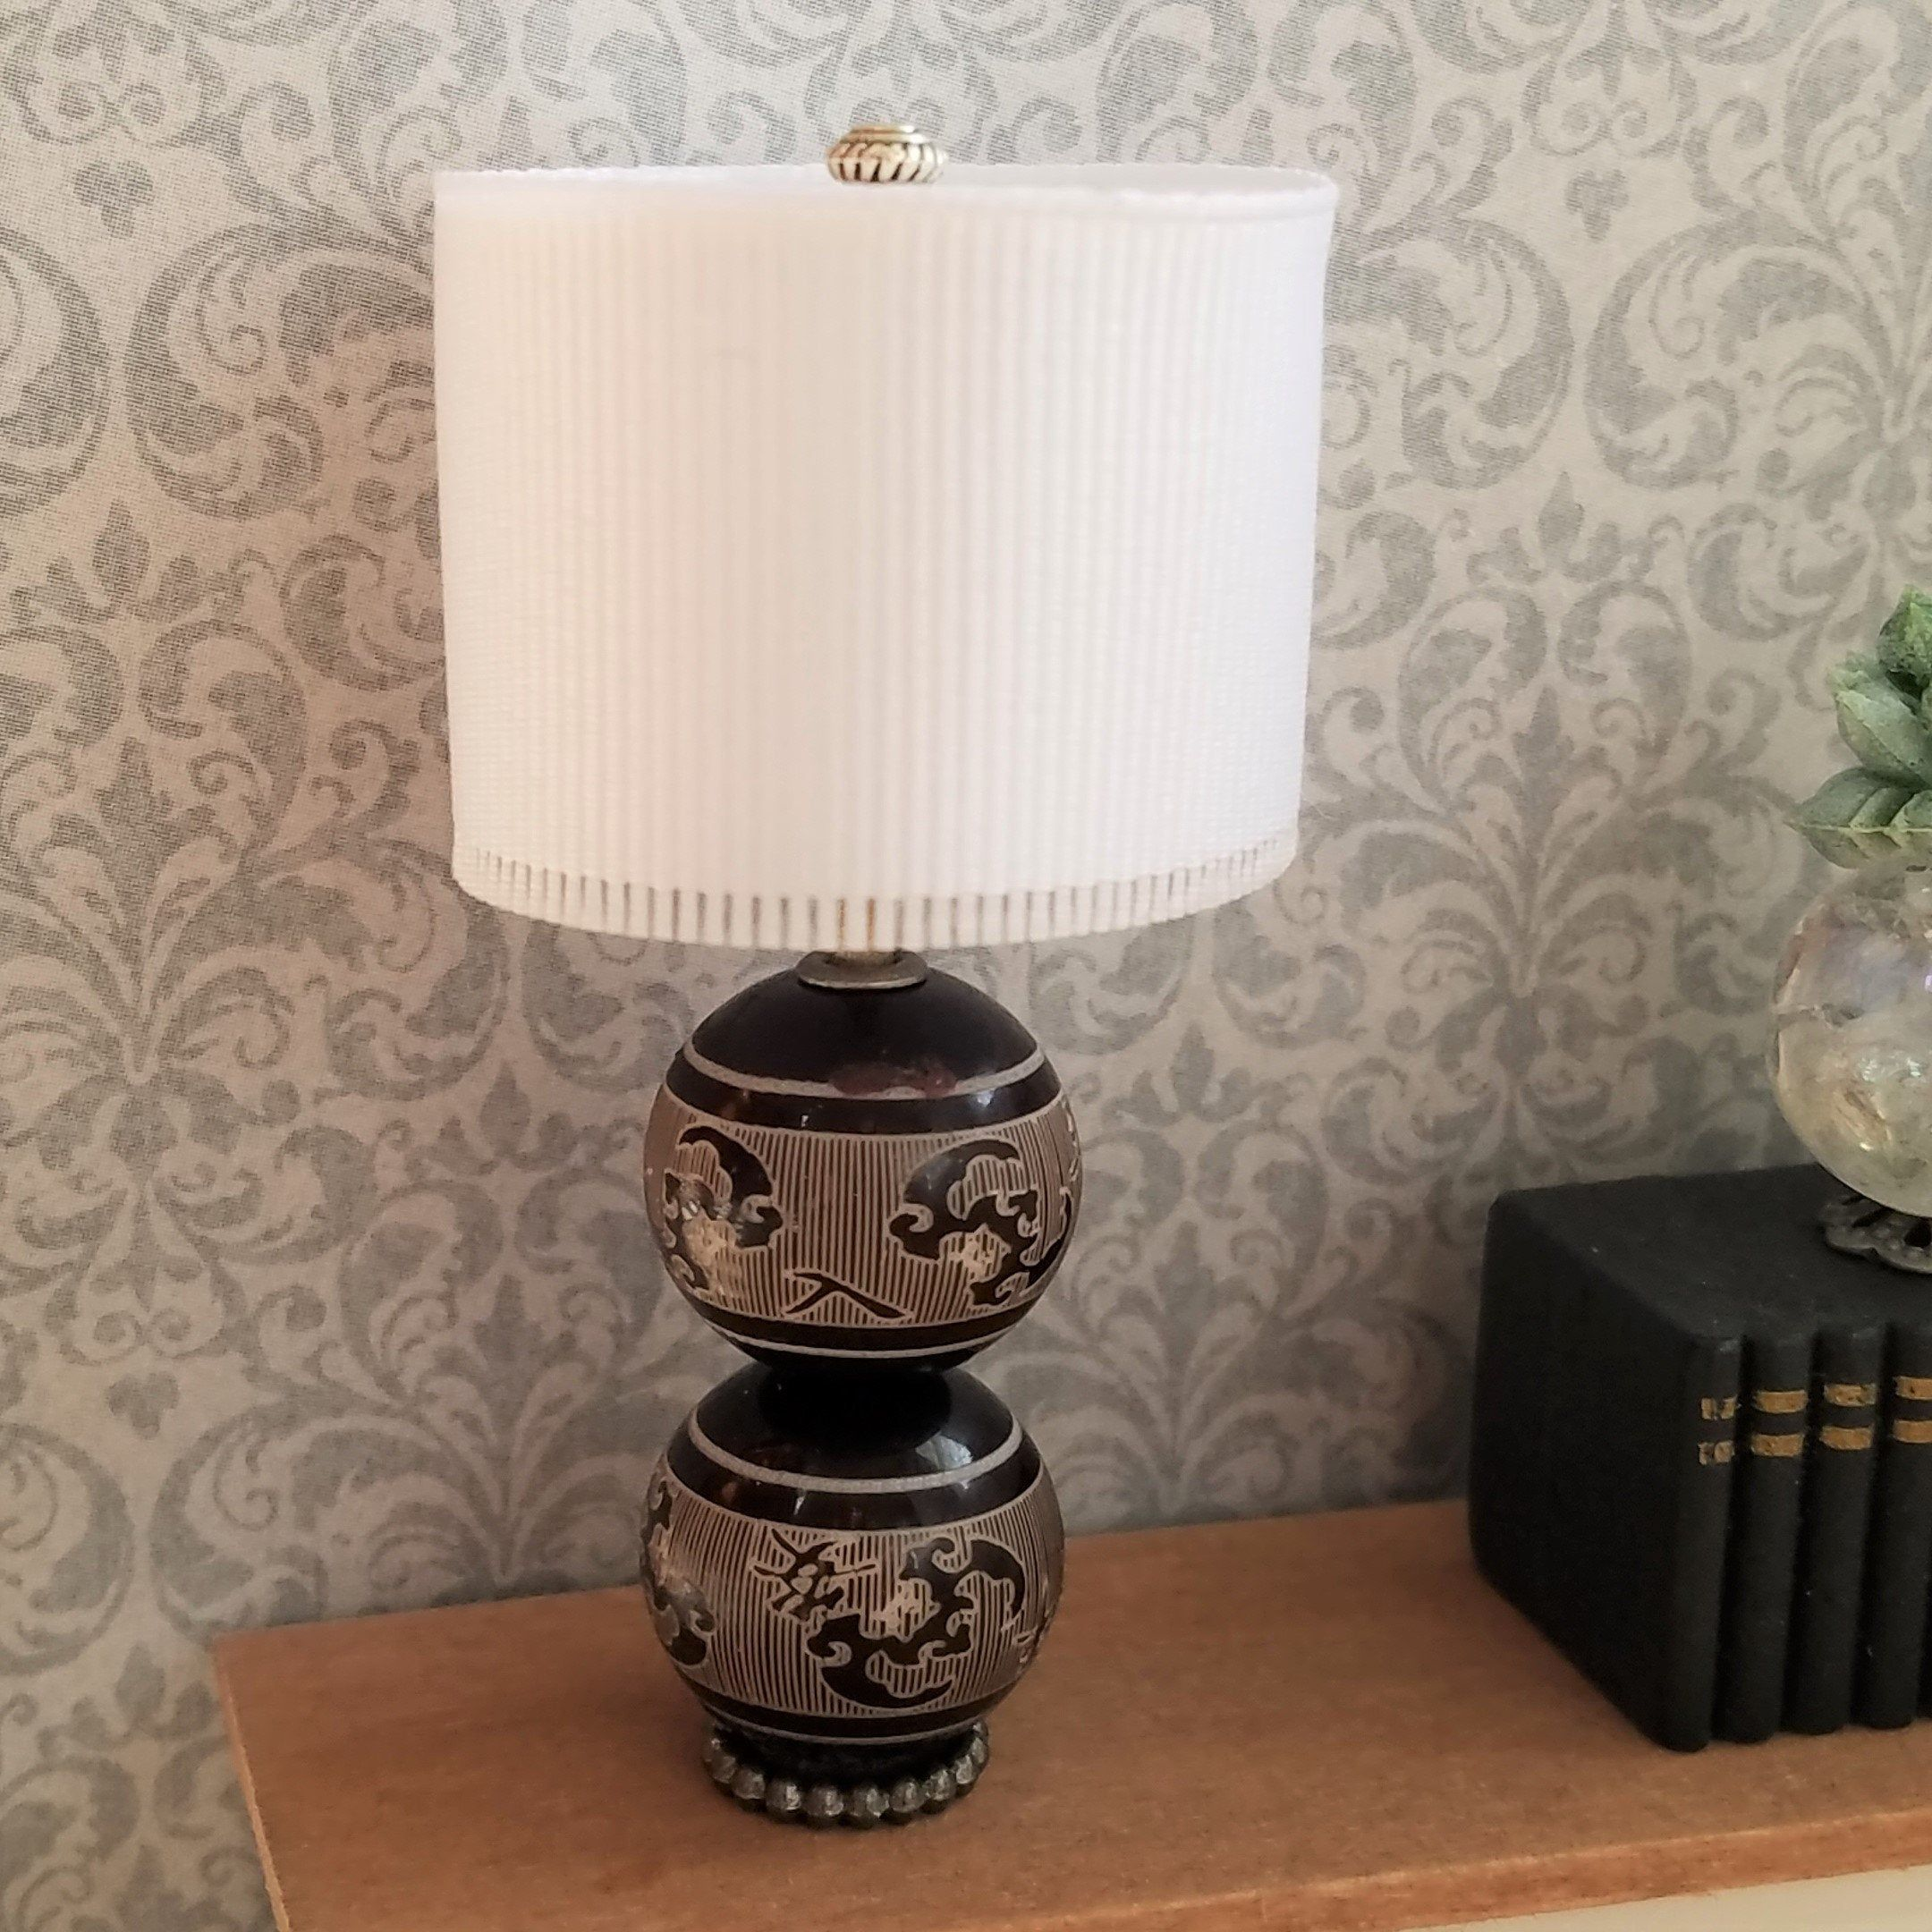 Miniature Lamps Miniature Table Lamps Miniature Lighting